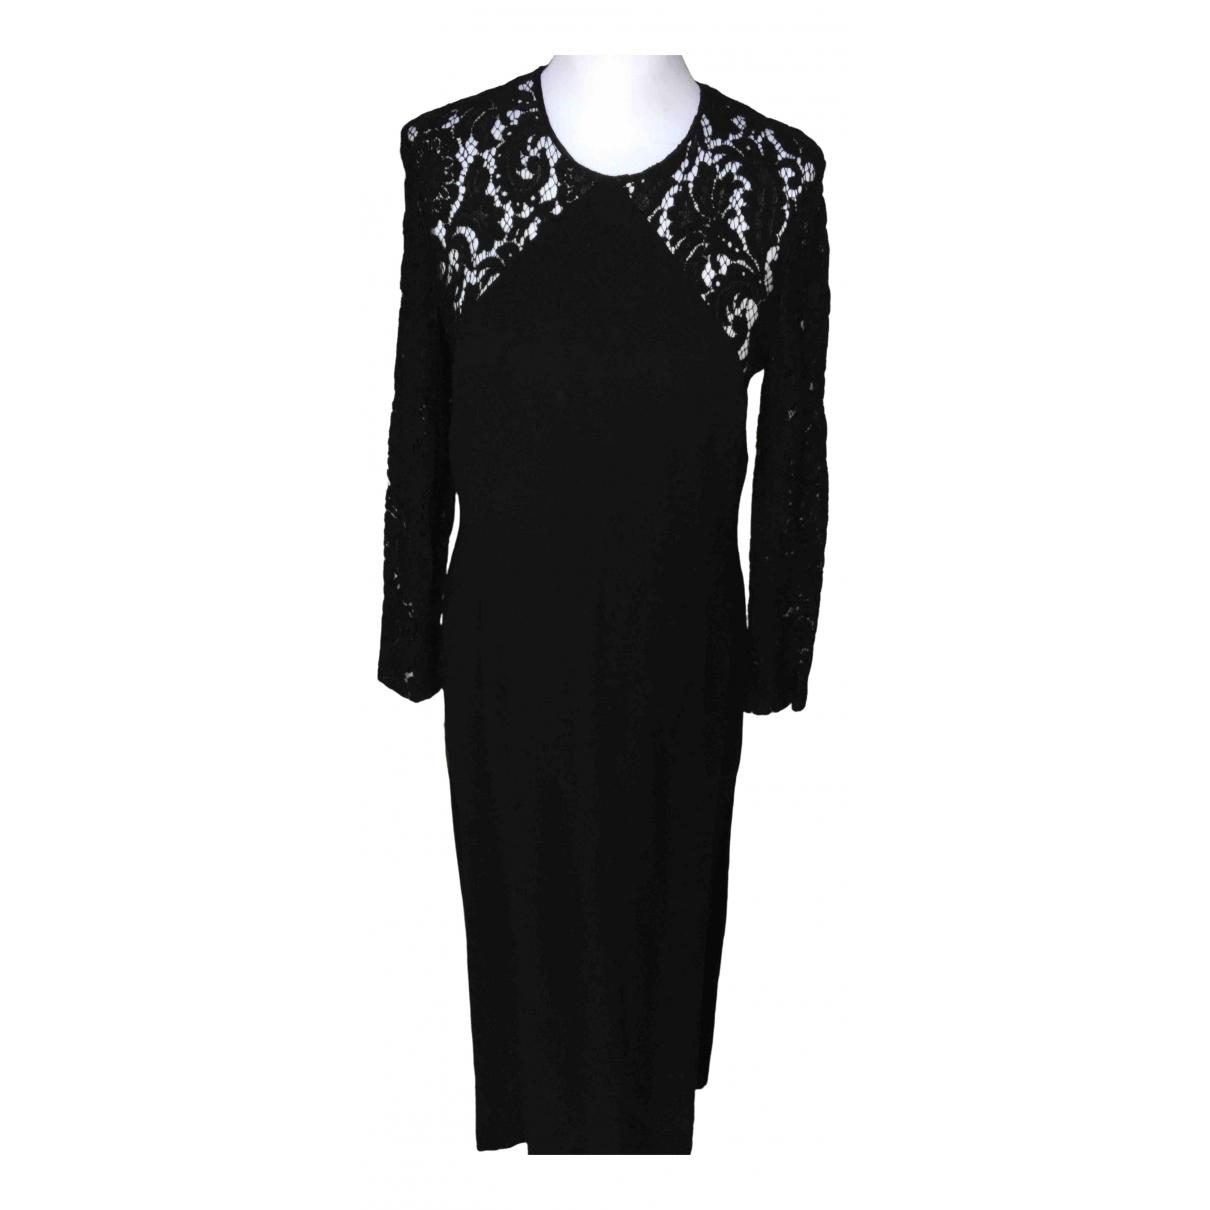 Celine \N Kleid in  Schwarz Synthetik